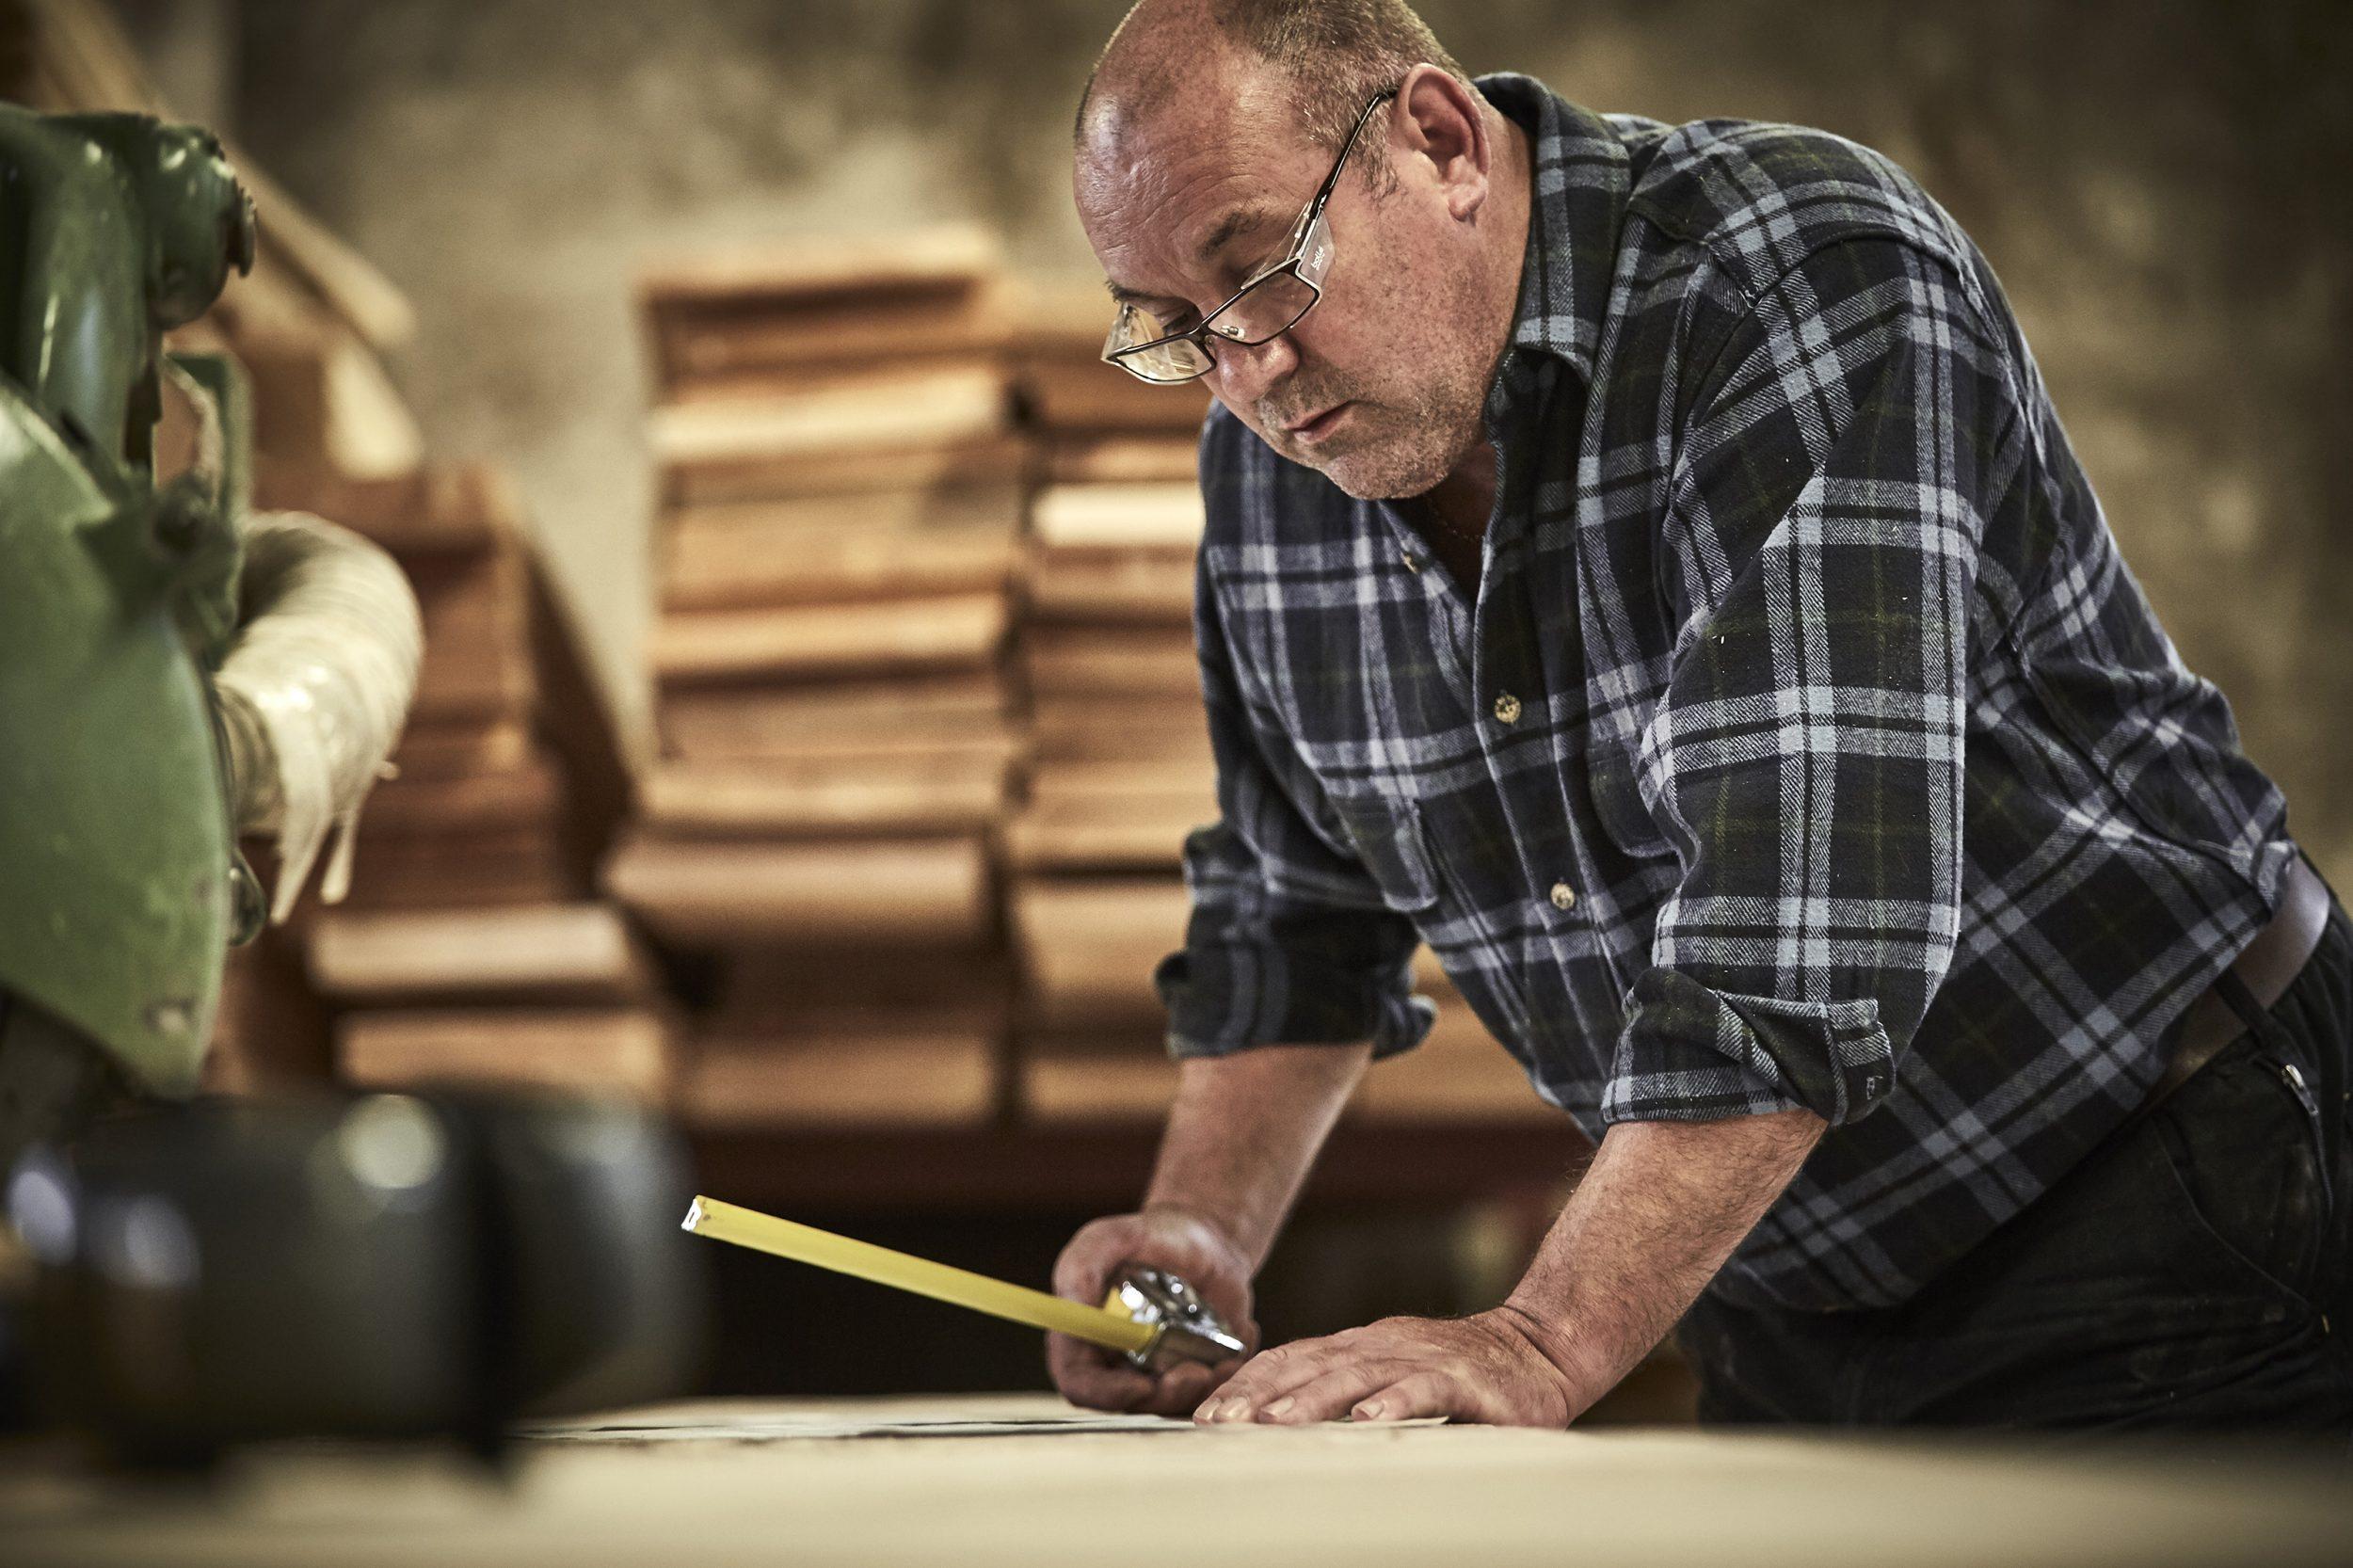 artisan measuring a length of wood